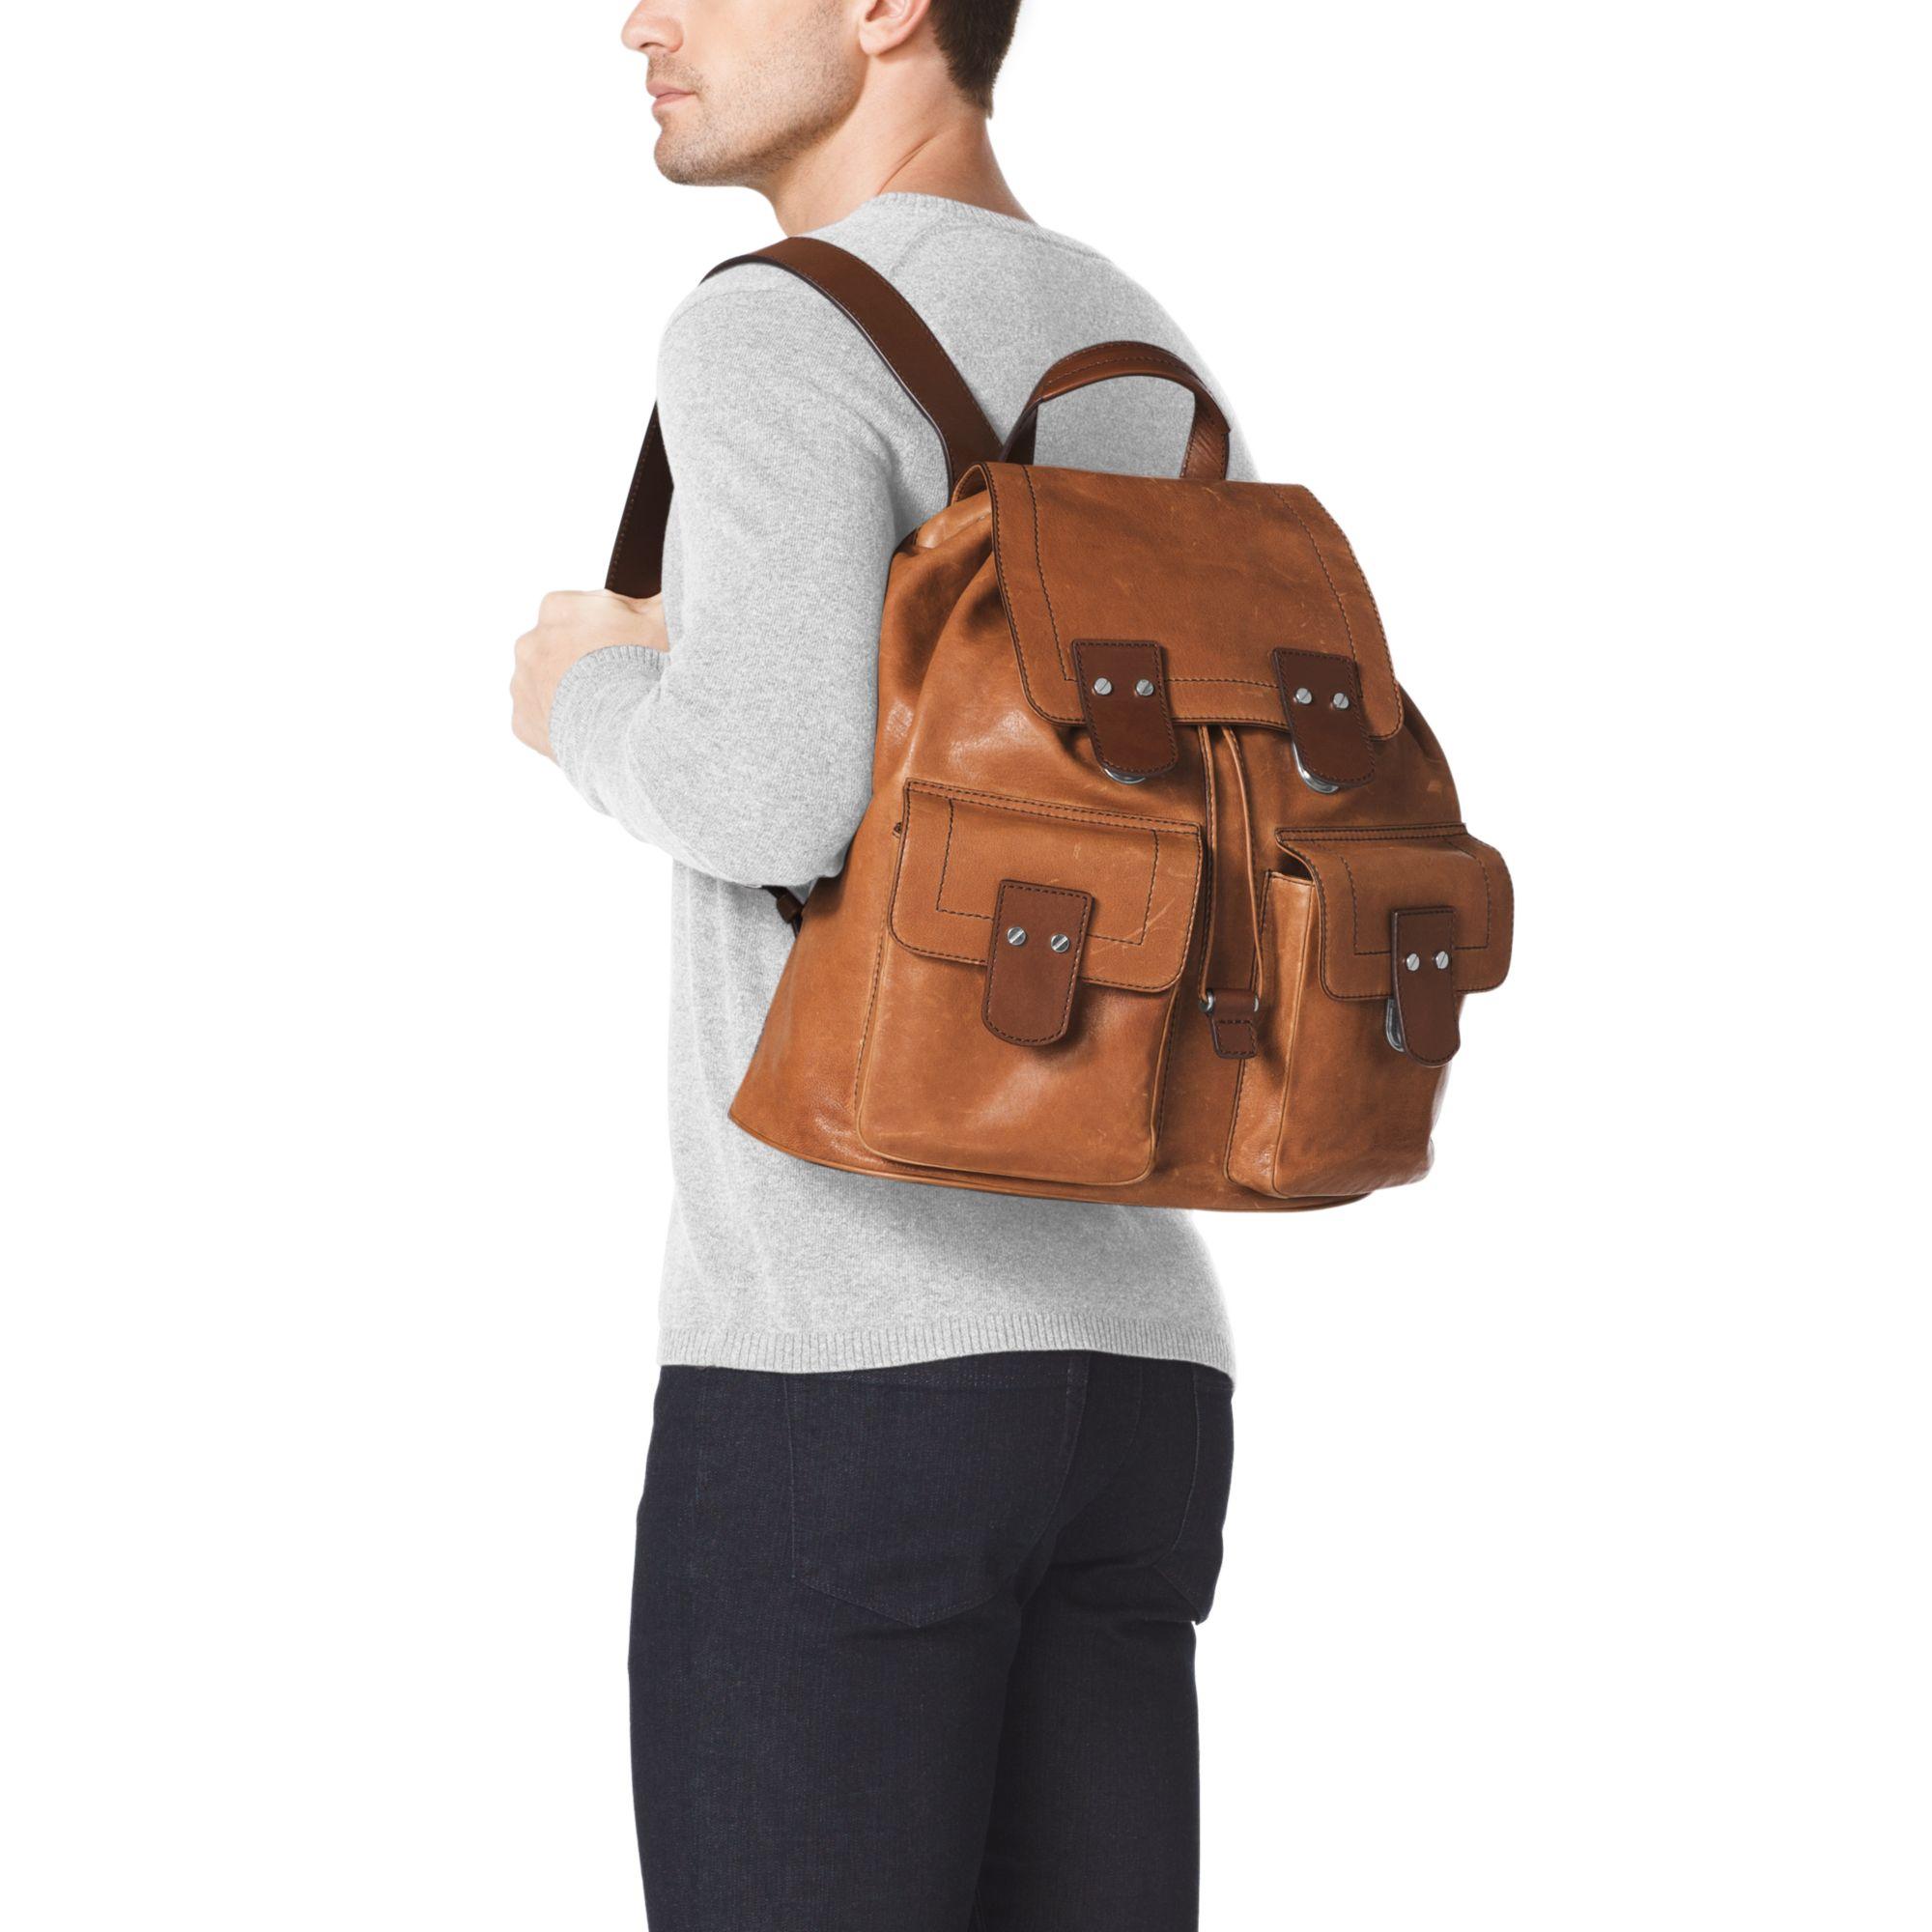 c05152aa15cd Michael Kors Wilder Vintage Leather Backpack in Brown for Men - Lyst